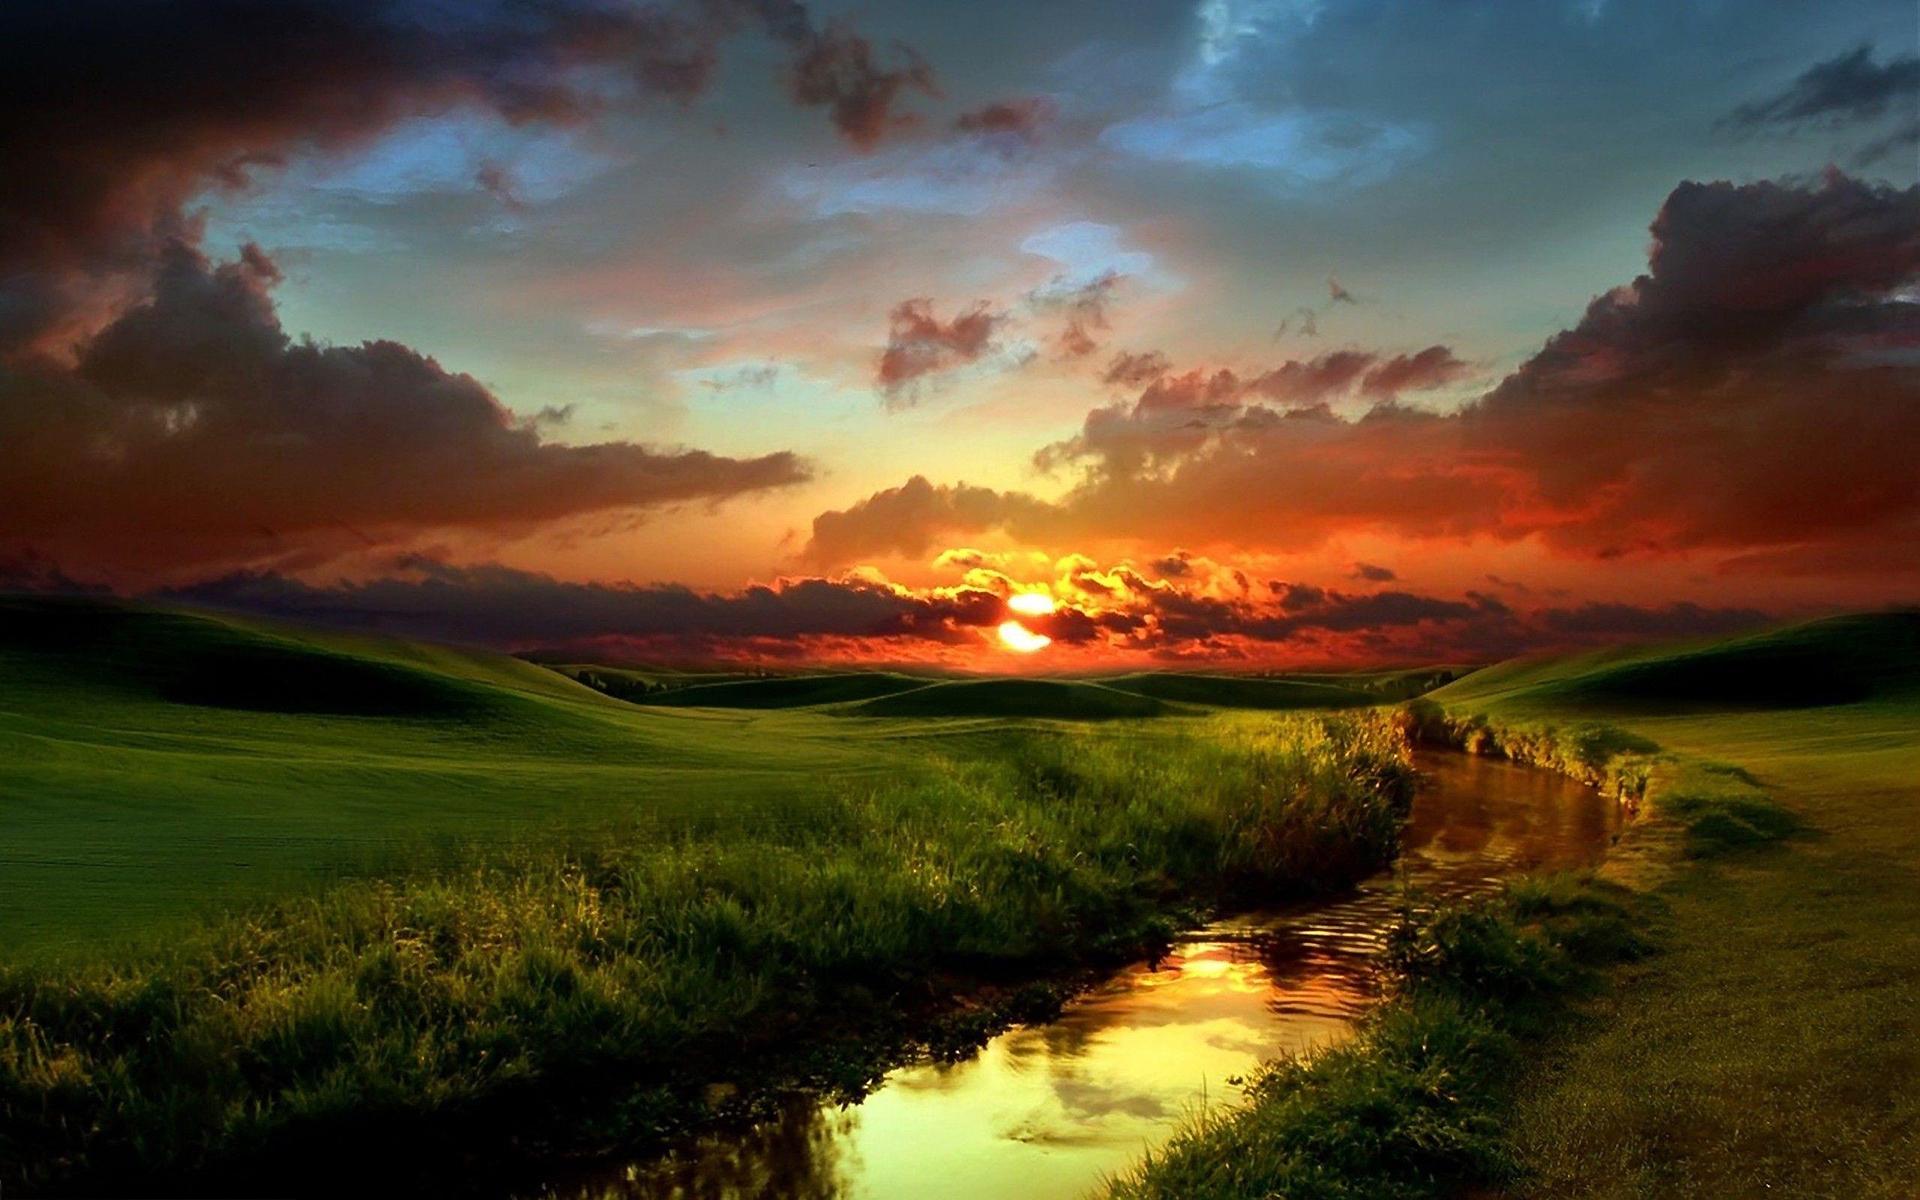 Sunset creek scenery